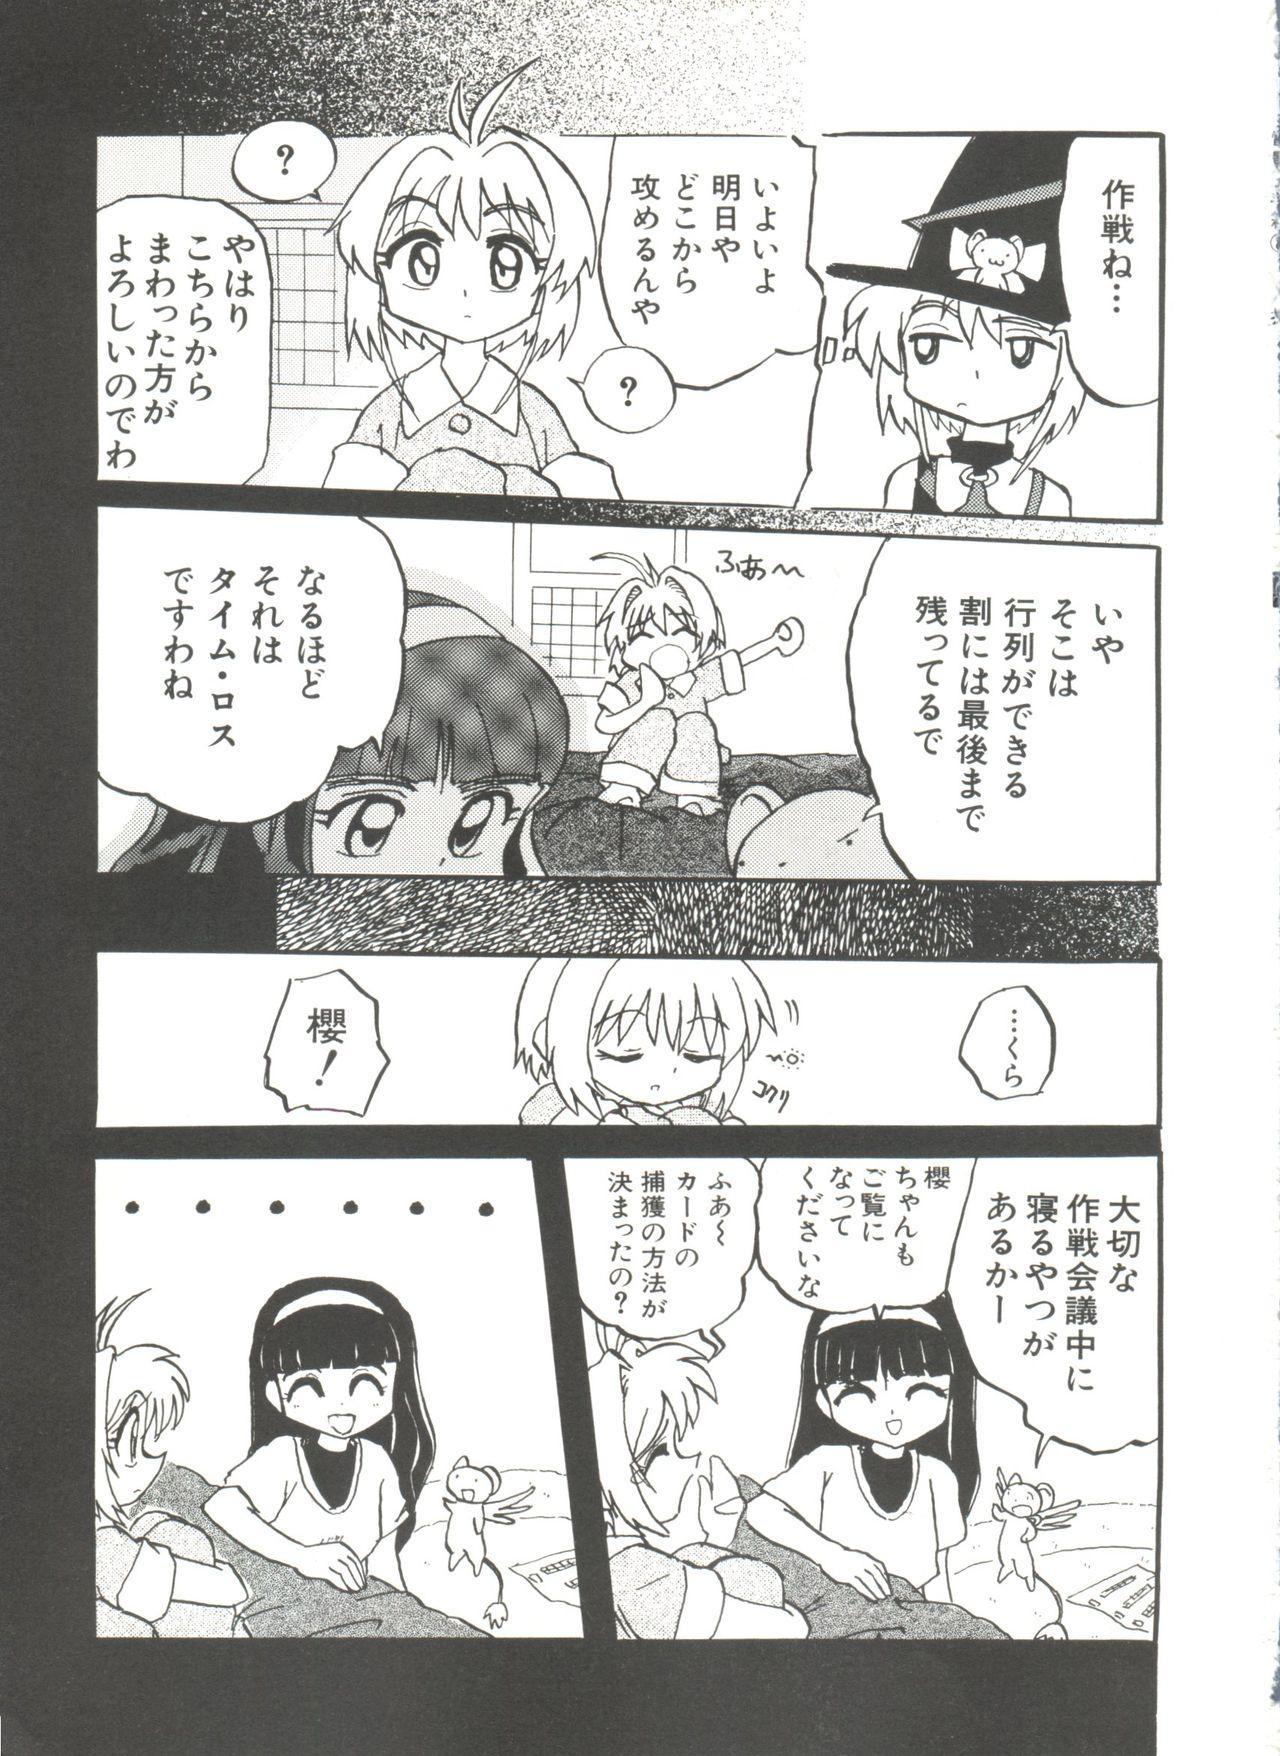 [Anthology] Denei Tamatebako 8 - Utakata no Tenshi-tachi II (Various) 114